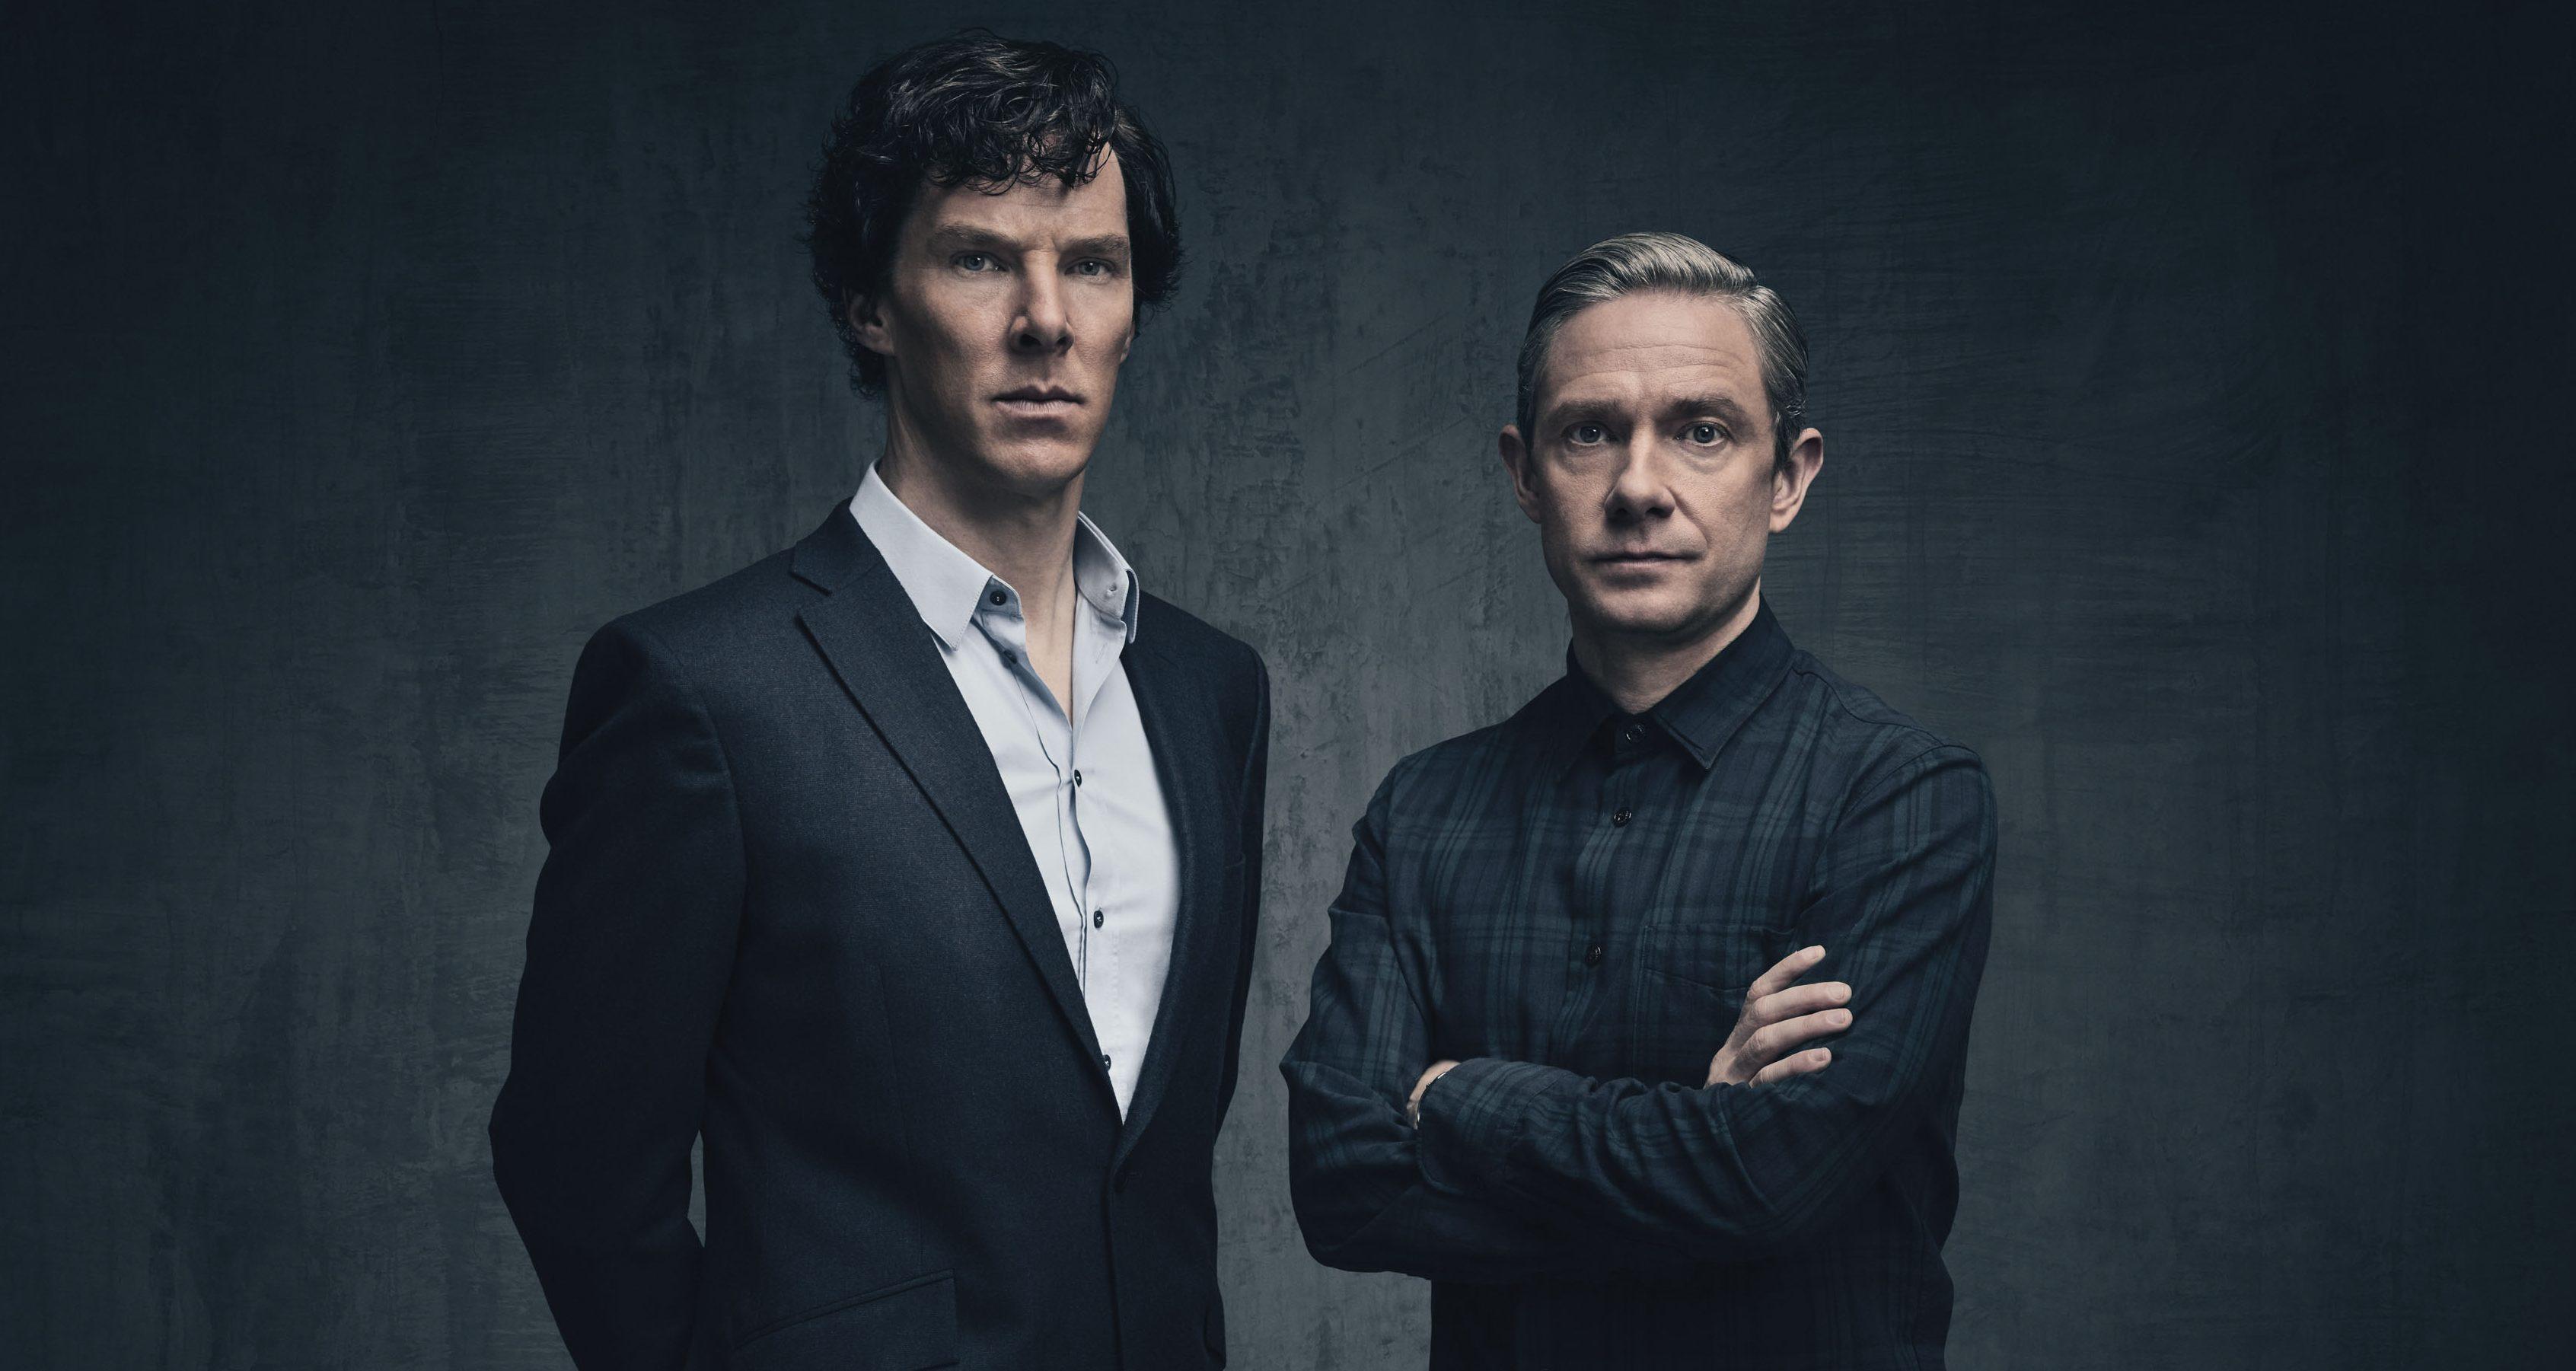 The final part to Sherlock season 4 will be shown on Sunday 15th January at 9pm (Hartswood Films; Todd Antony)